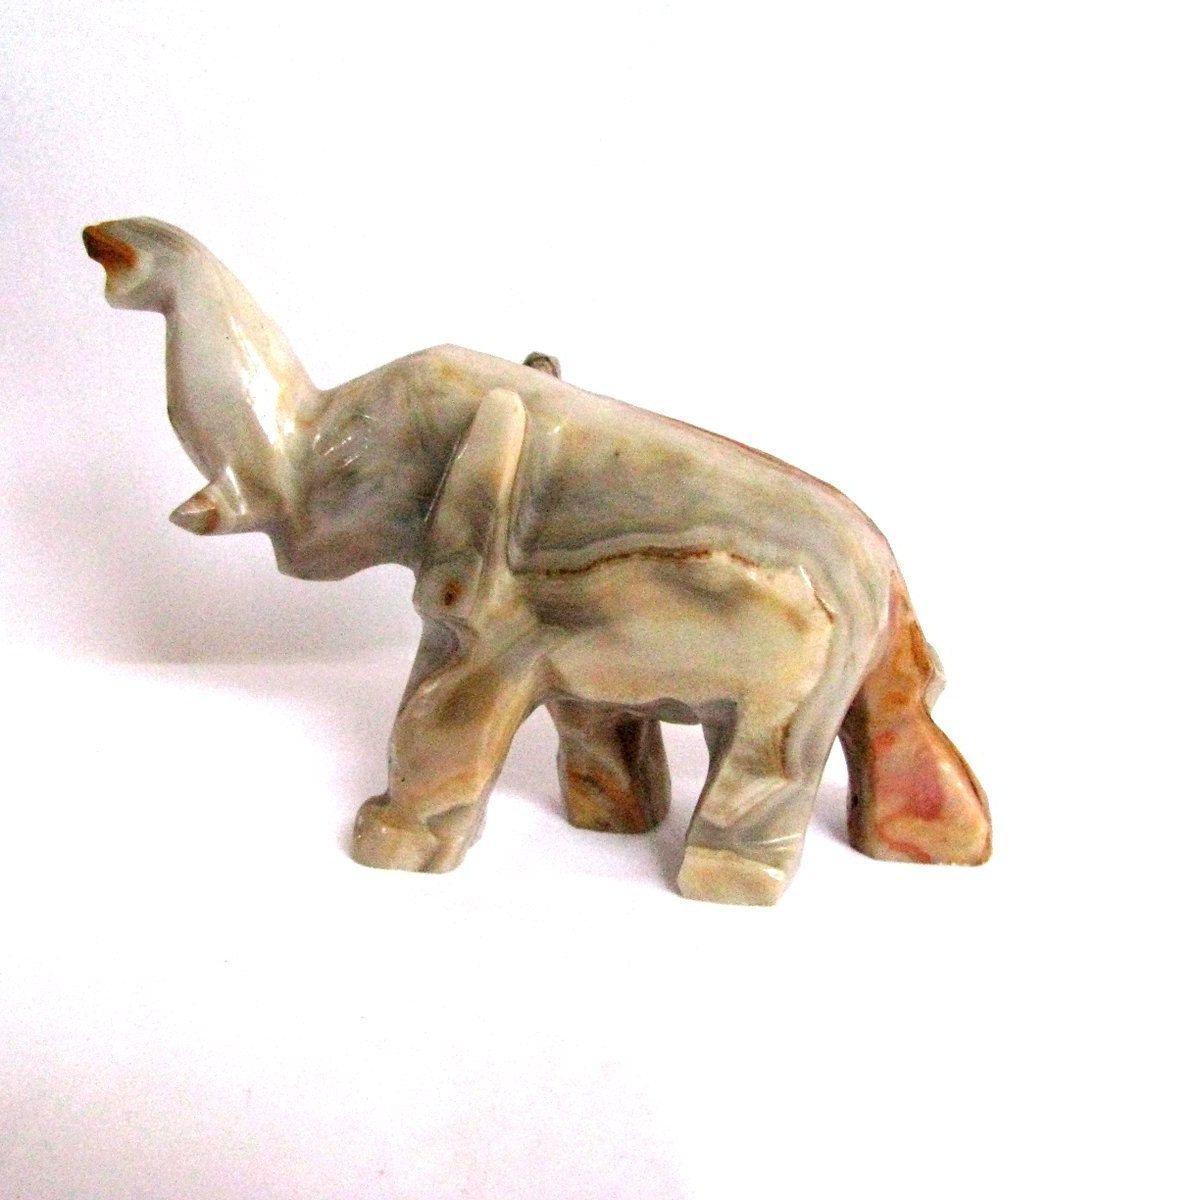 Elephant Elephant Statue Gift Home Decor Statue Housewarming Gift